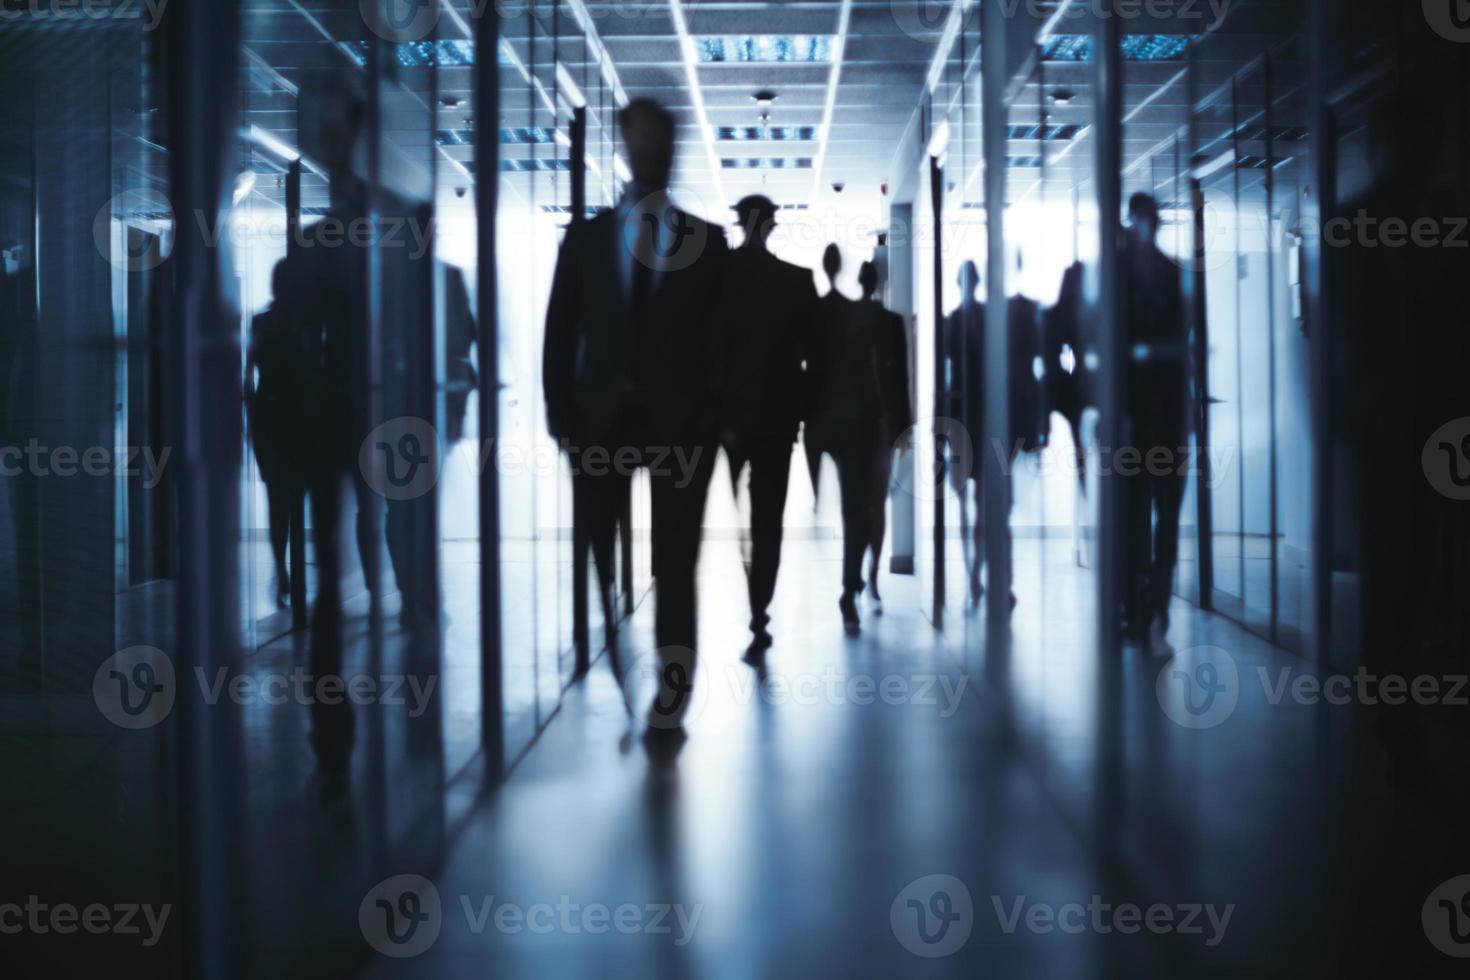 uomini d'affari a piedi foto